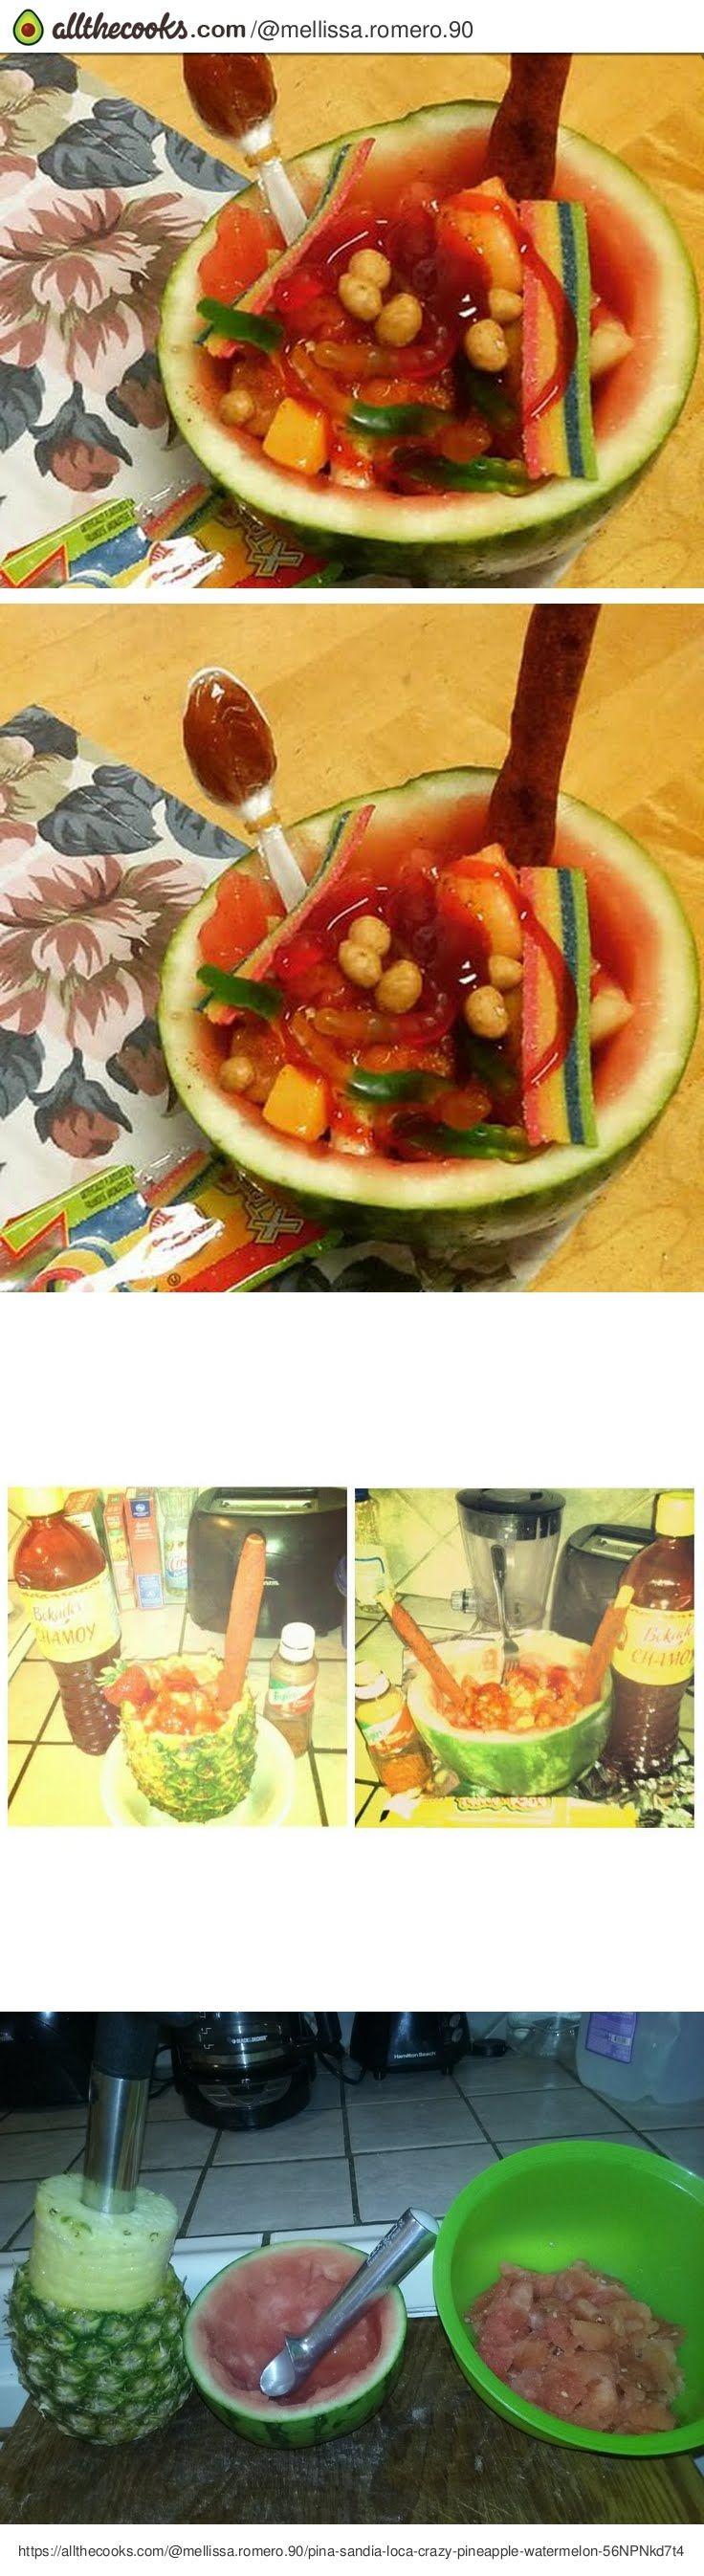 Piña/sandia Loca Crazy Pineapple/watermelon